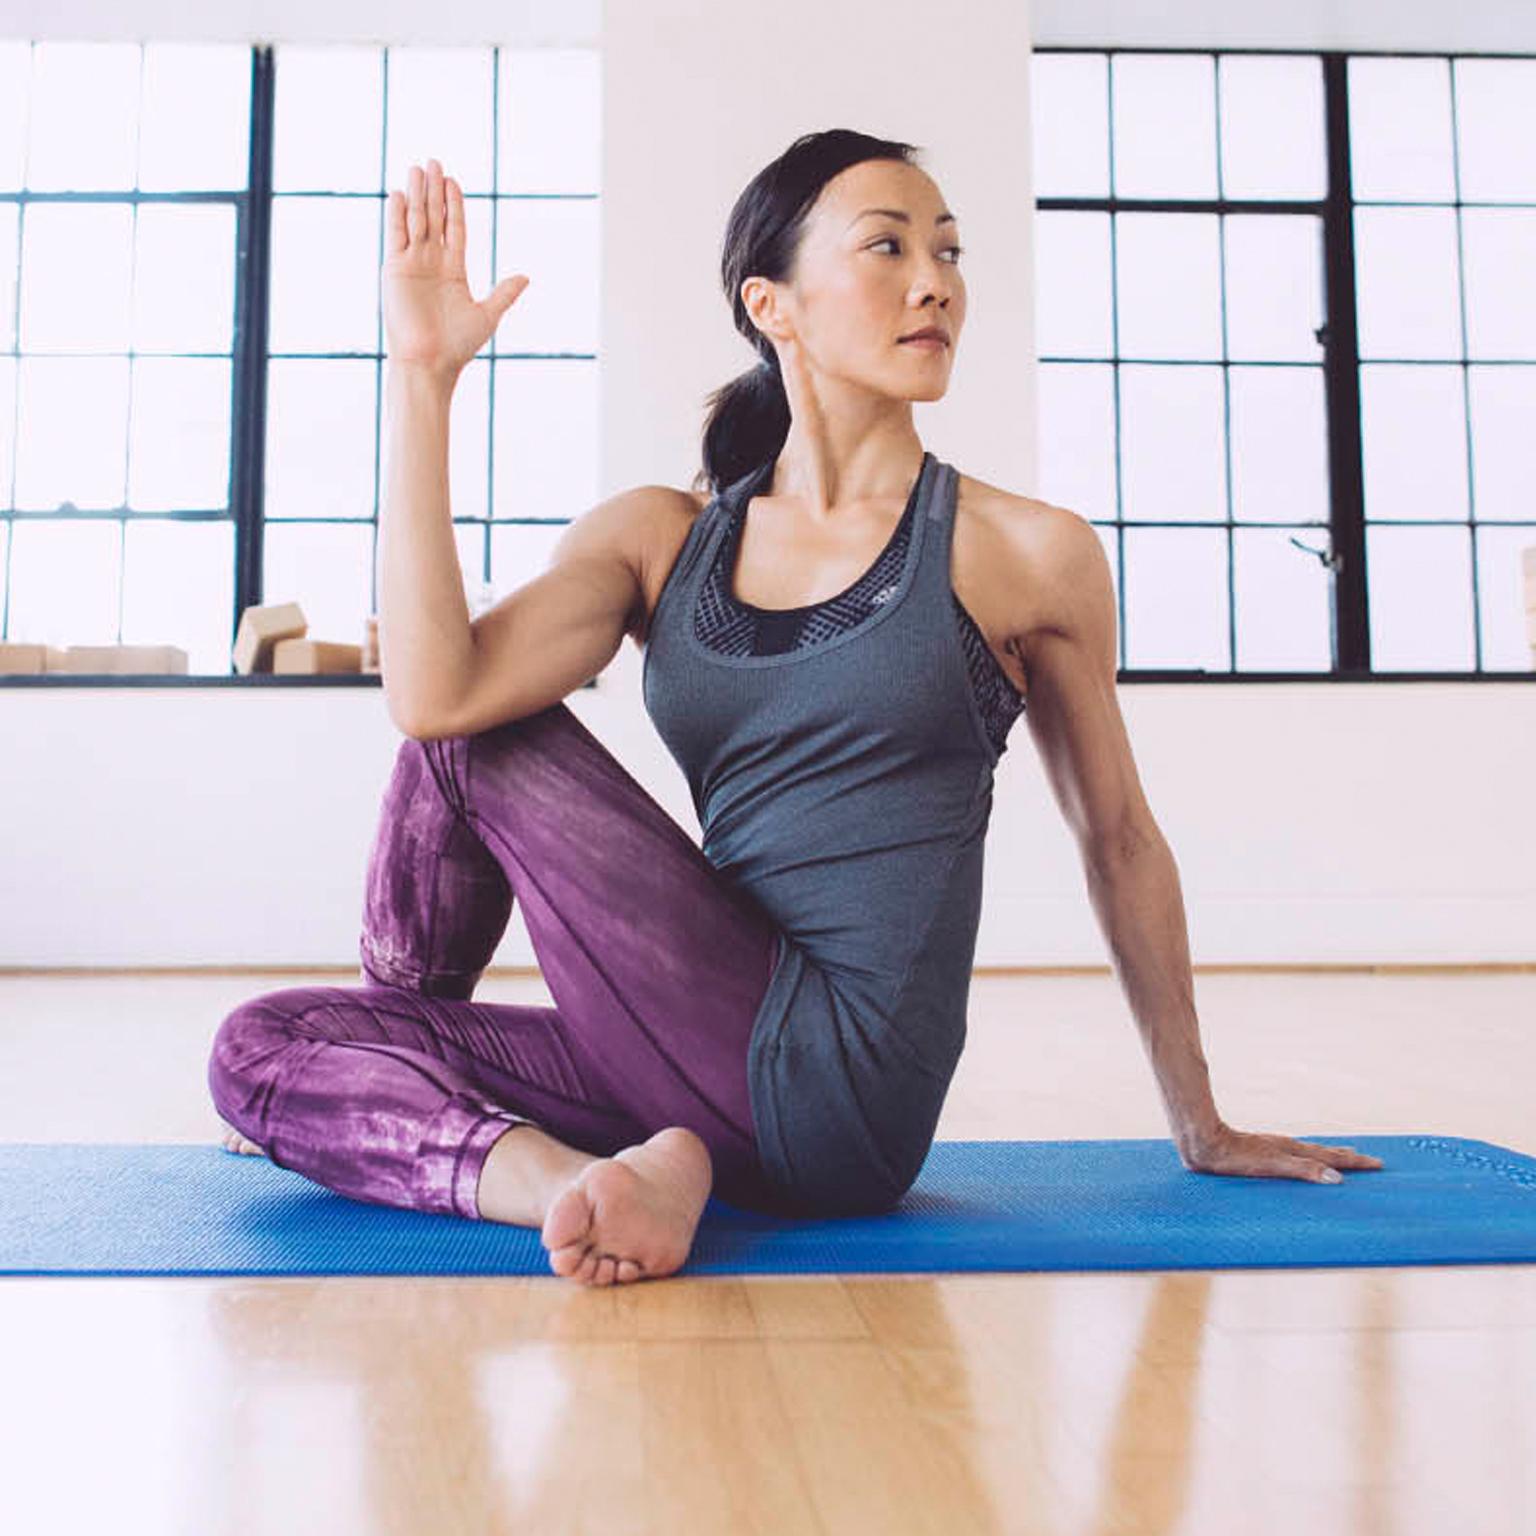 Toronto-Fitness-Model-Agency-Yoga-Sport-Chek-Commercial-Lifestyle-Virginial-Lee